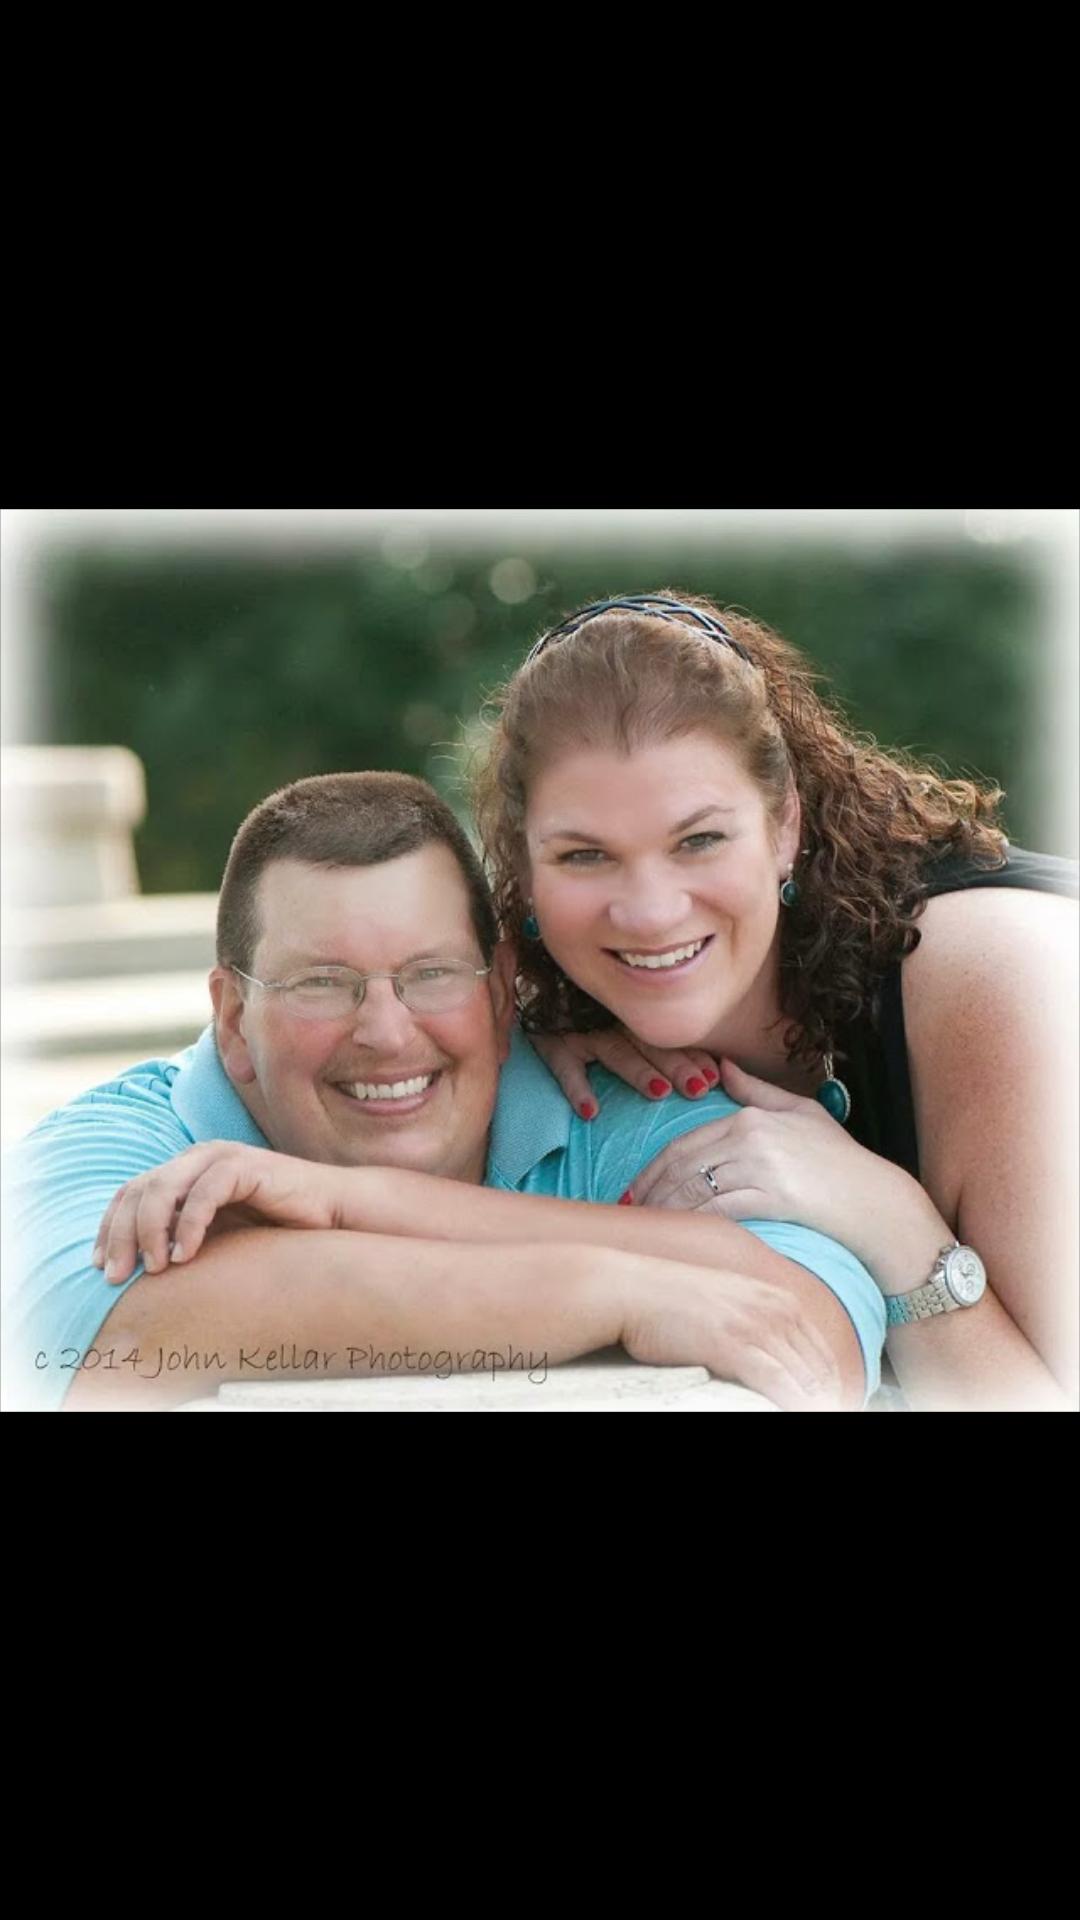 Our Engagement Apr 2015 & Wedding June 2015